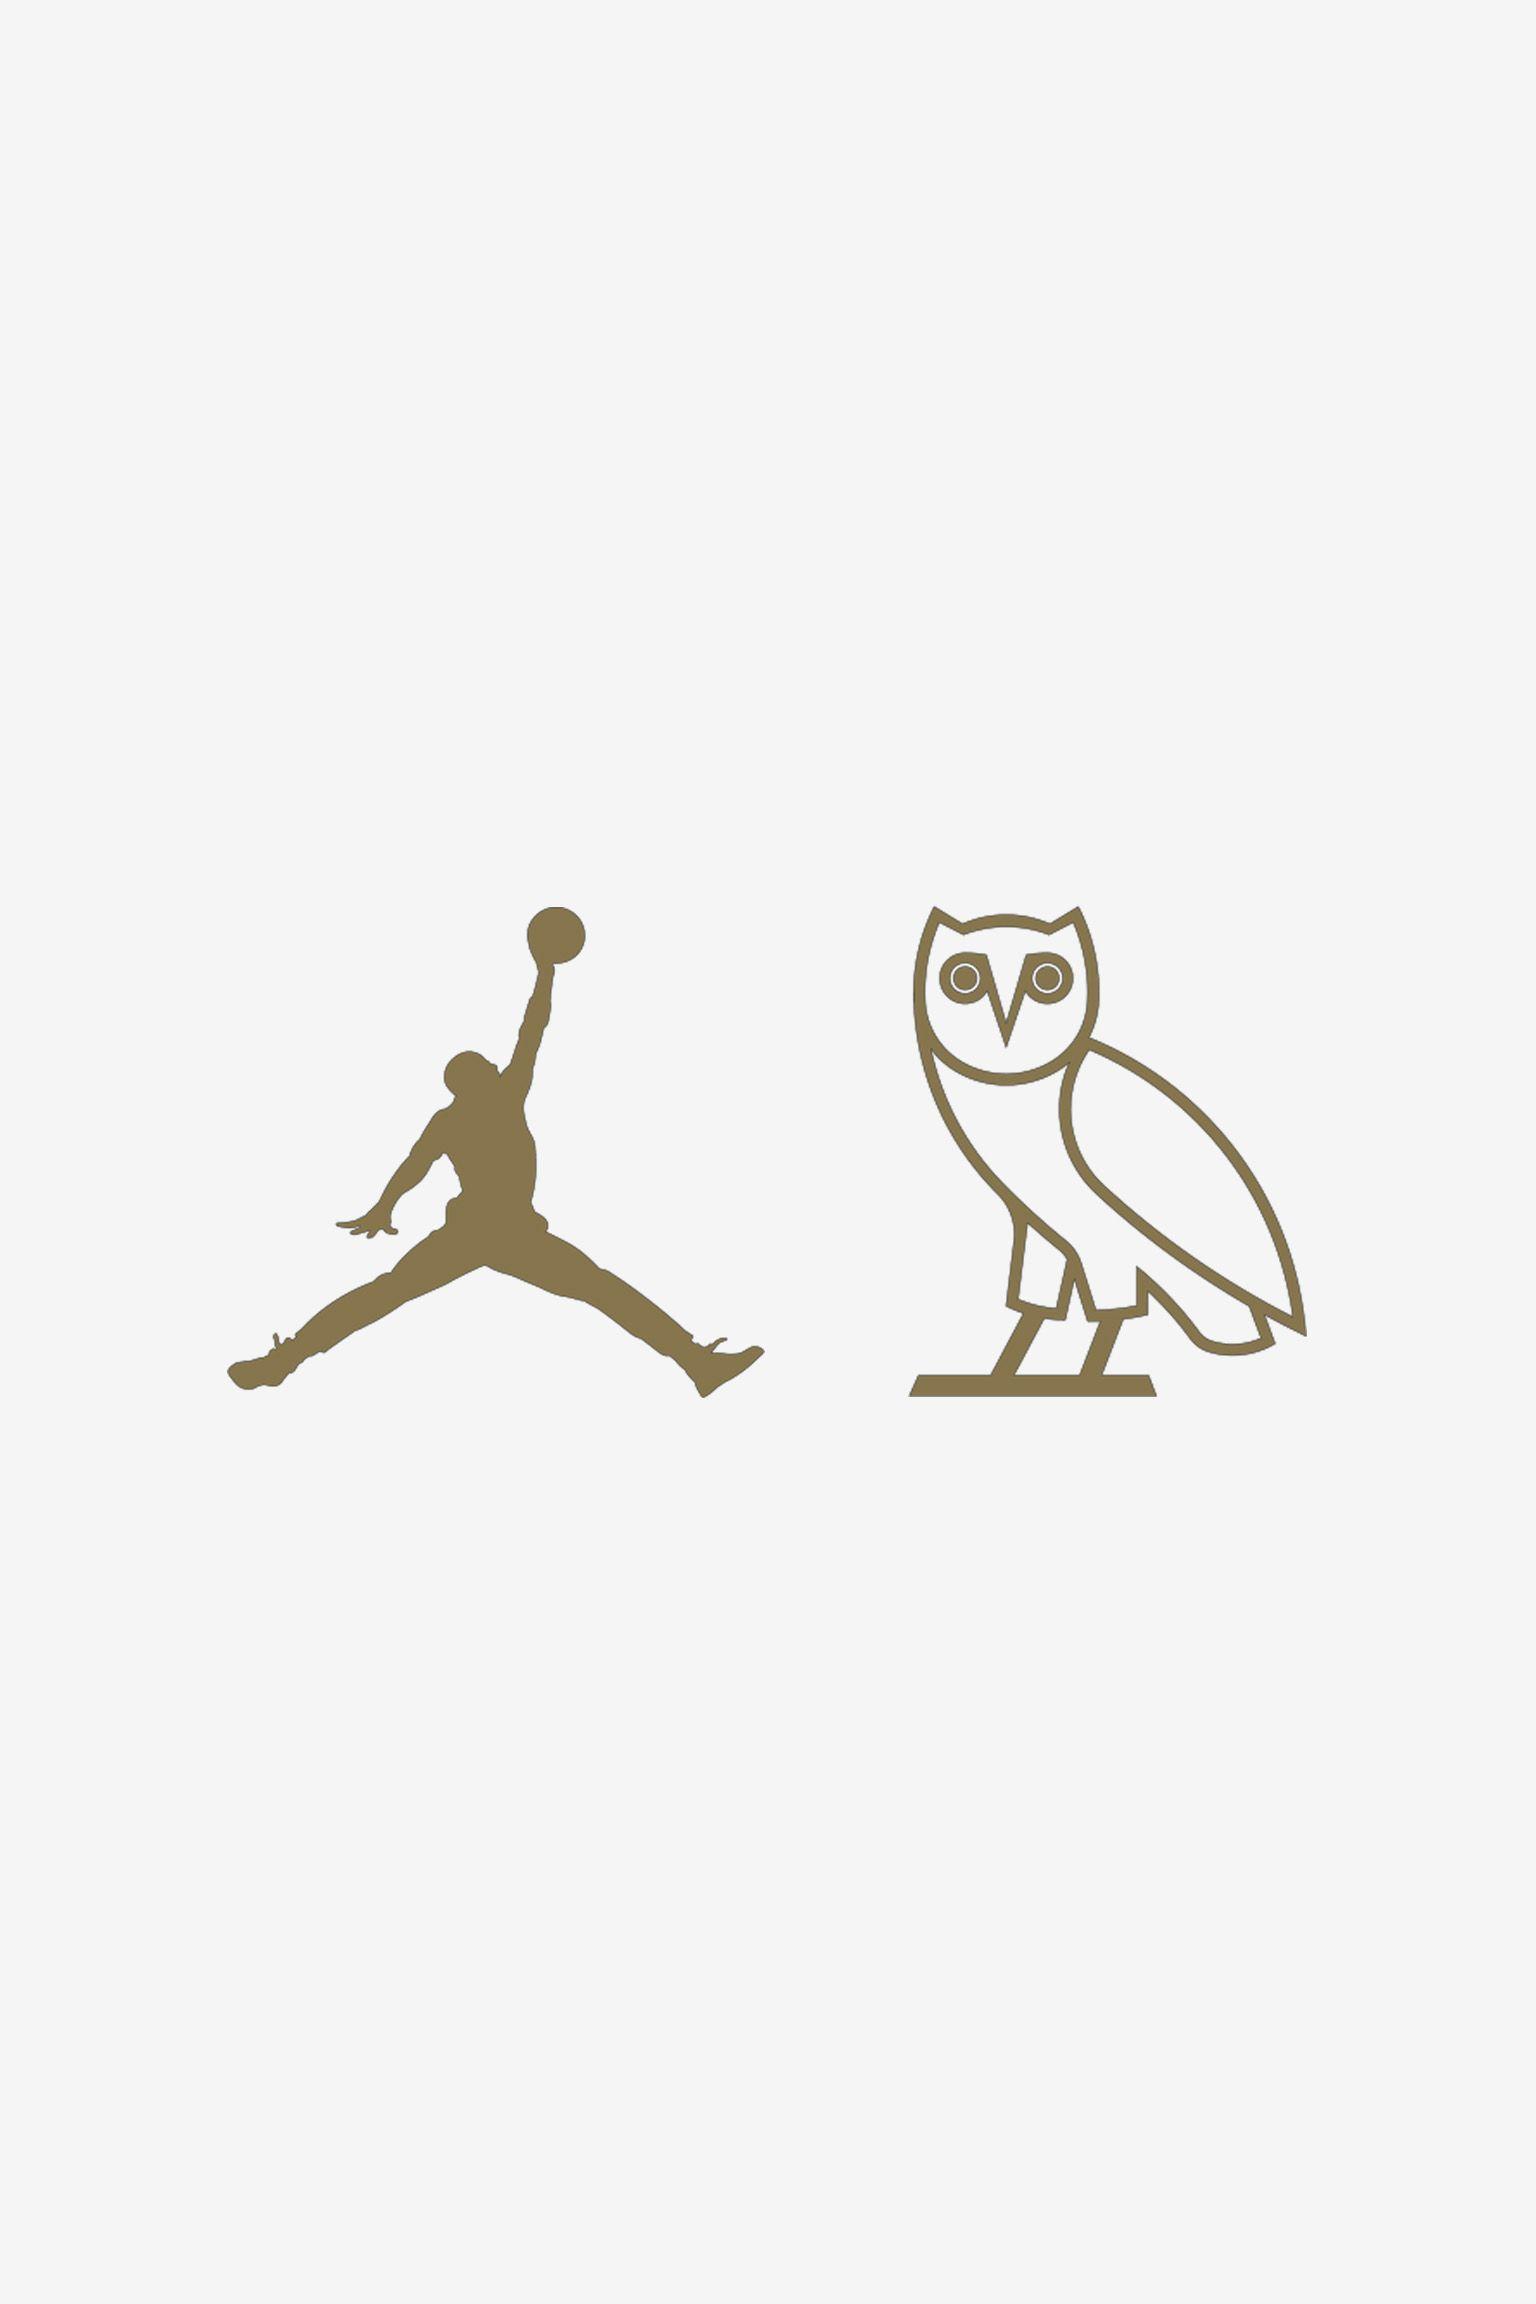 Air Jordan 12 OVO 'White & Metallic Gold' Release Date